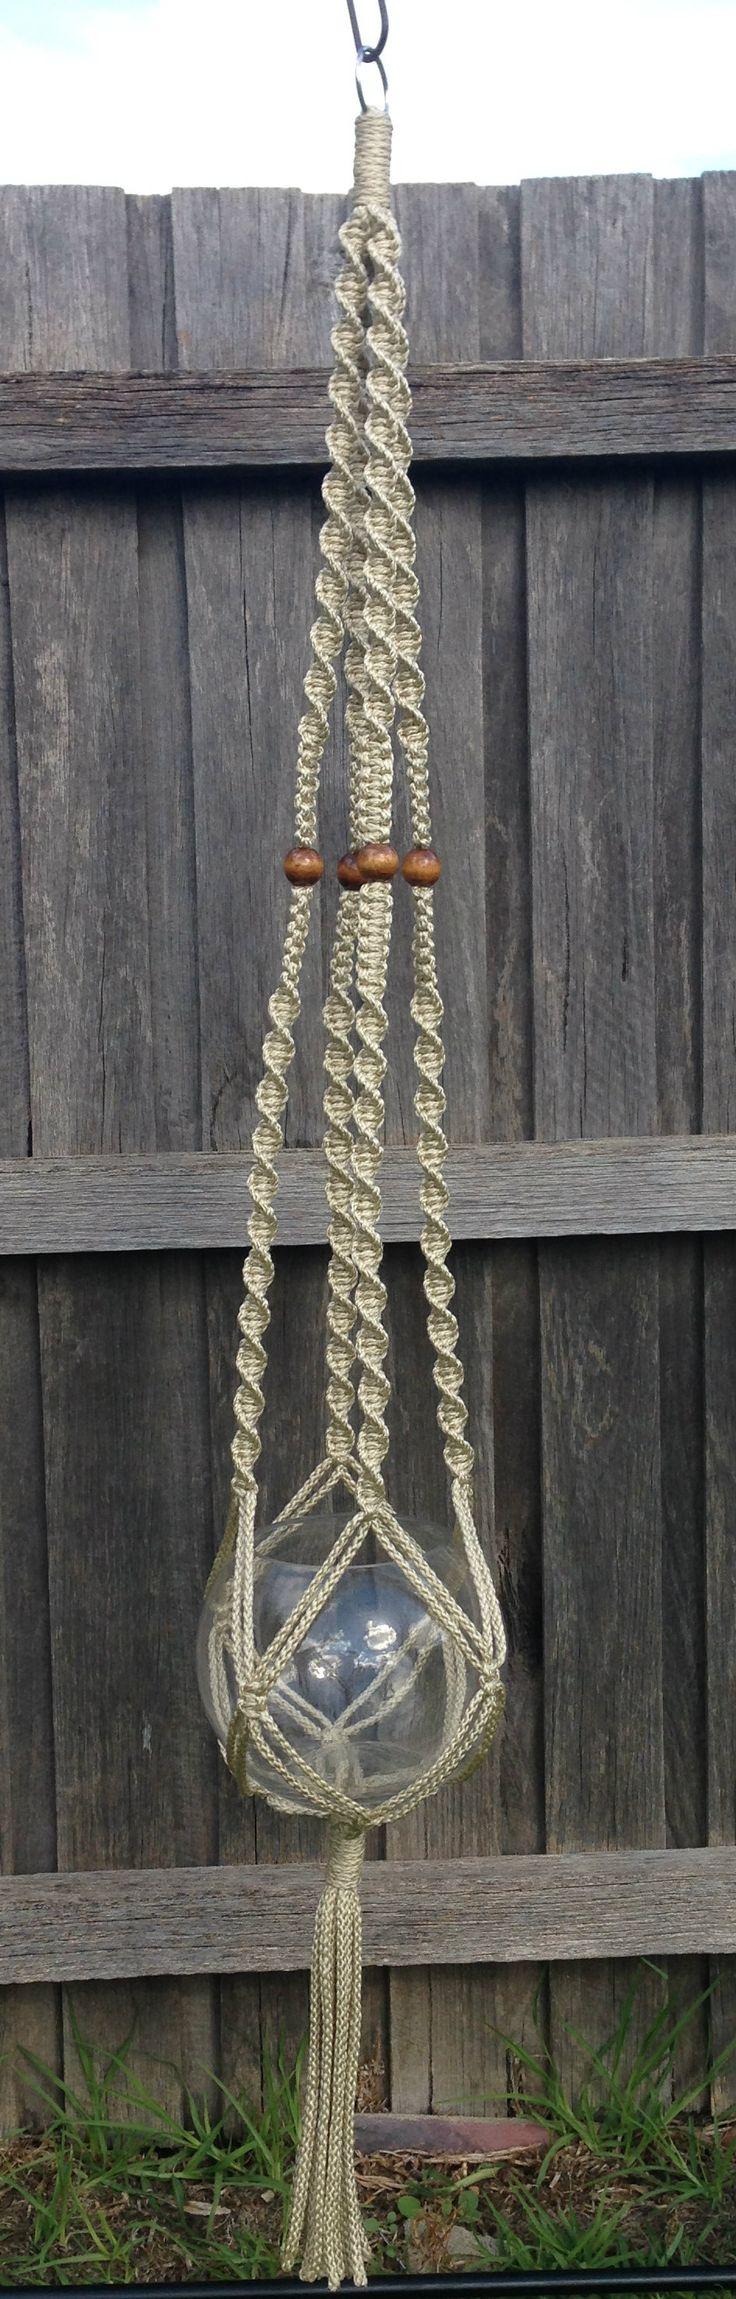 Macramé Hanging Basket - Pearl Beige www.knotsandbrushes.com.au